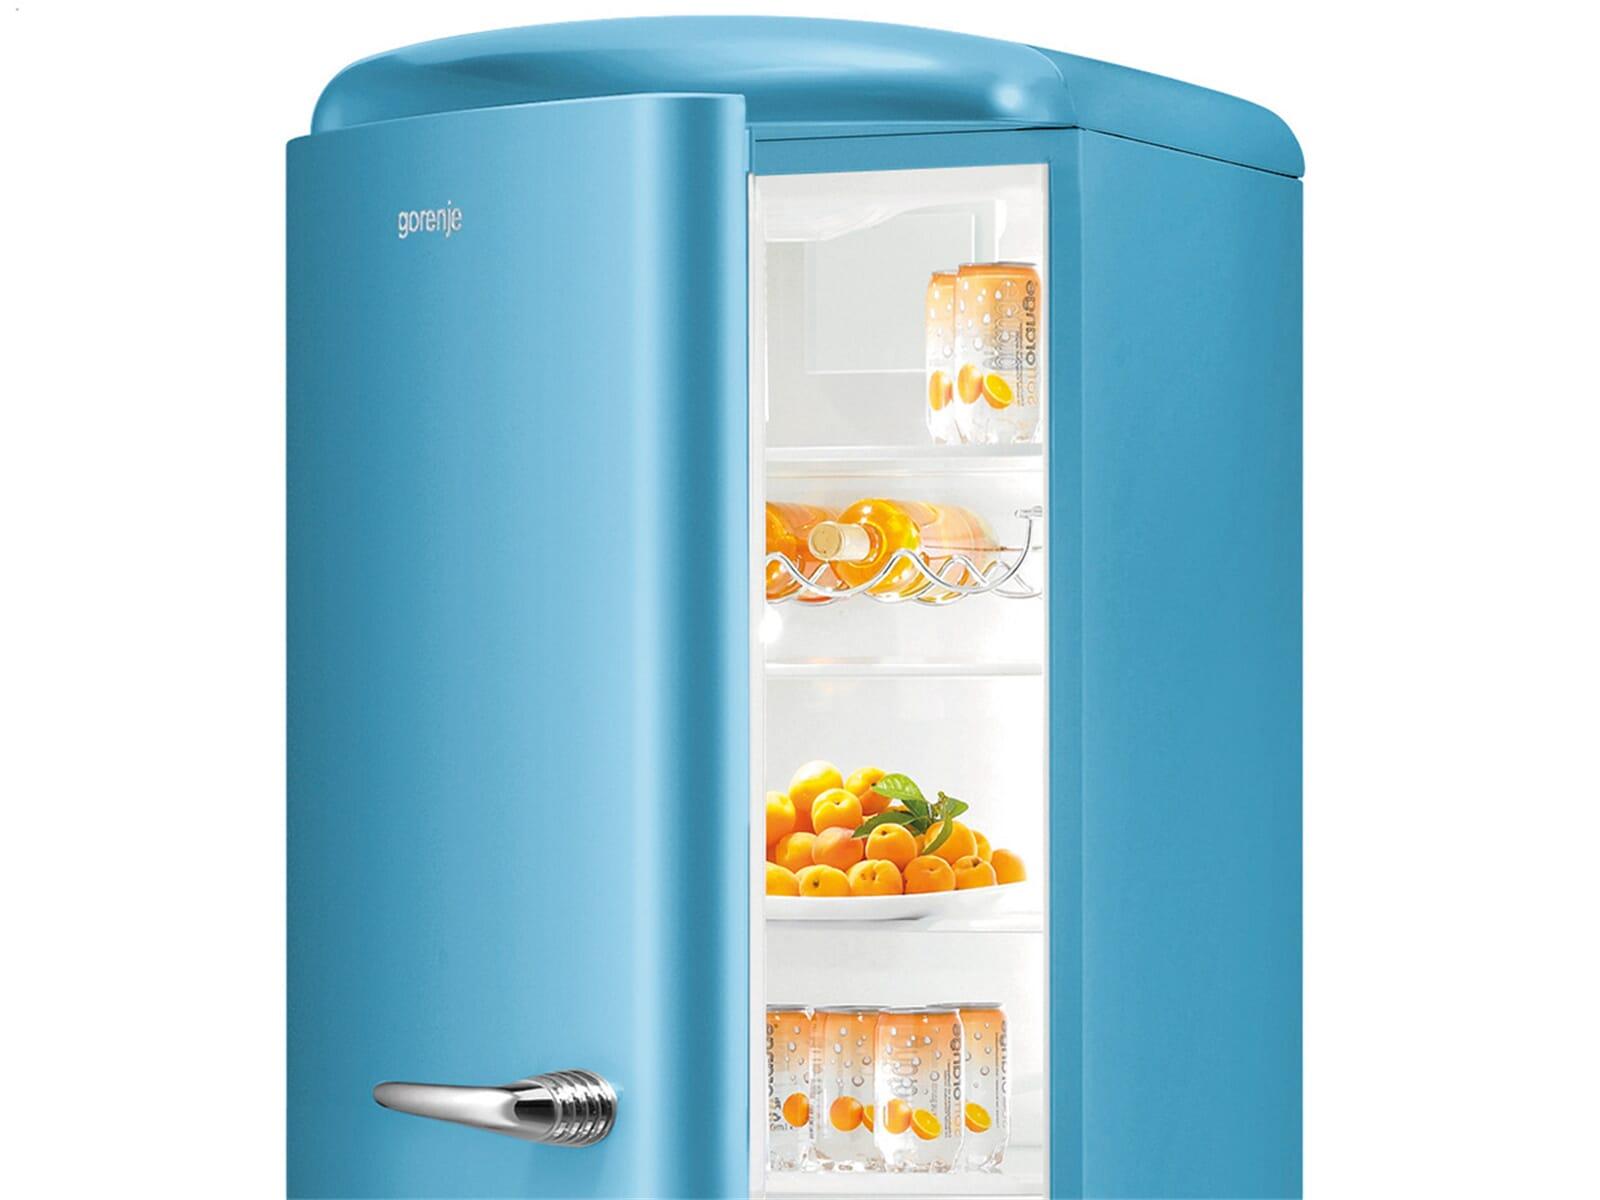 Gorenje Kühlschrank Blau : Gorenje rk obl l kühl gefrierkombination baby blue